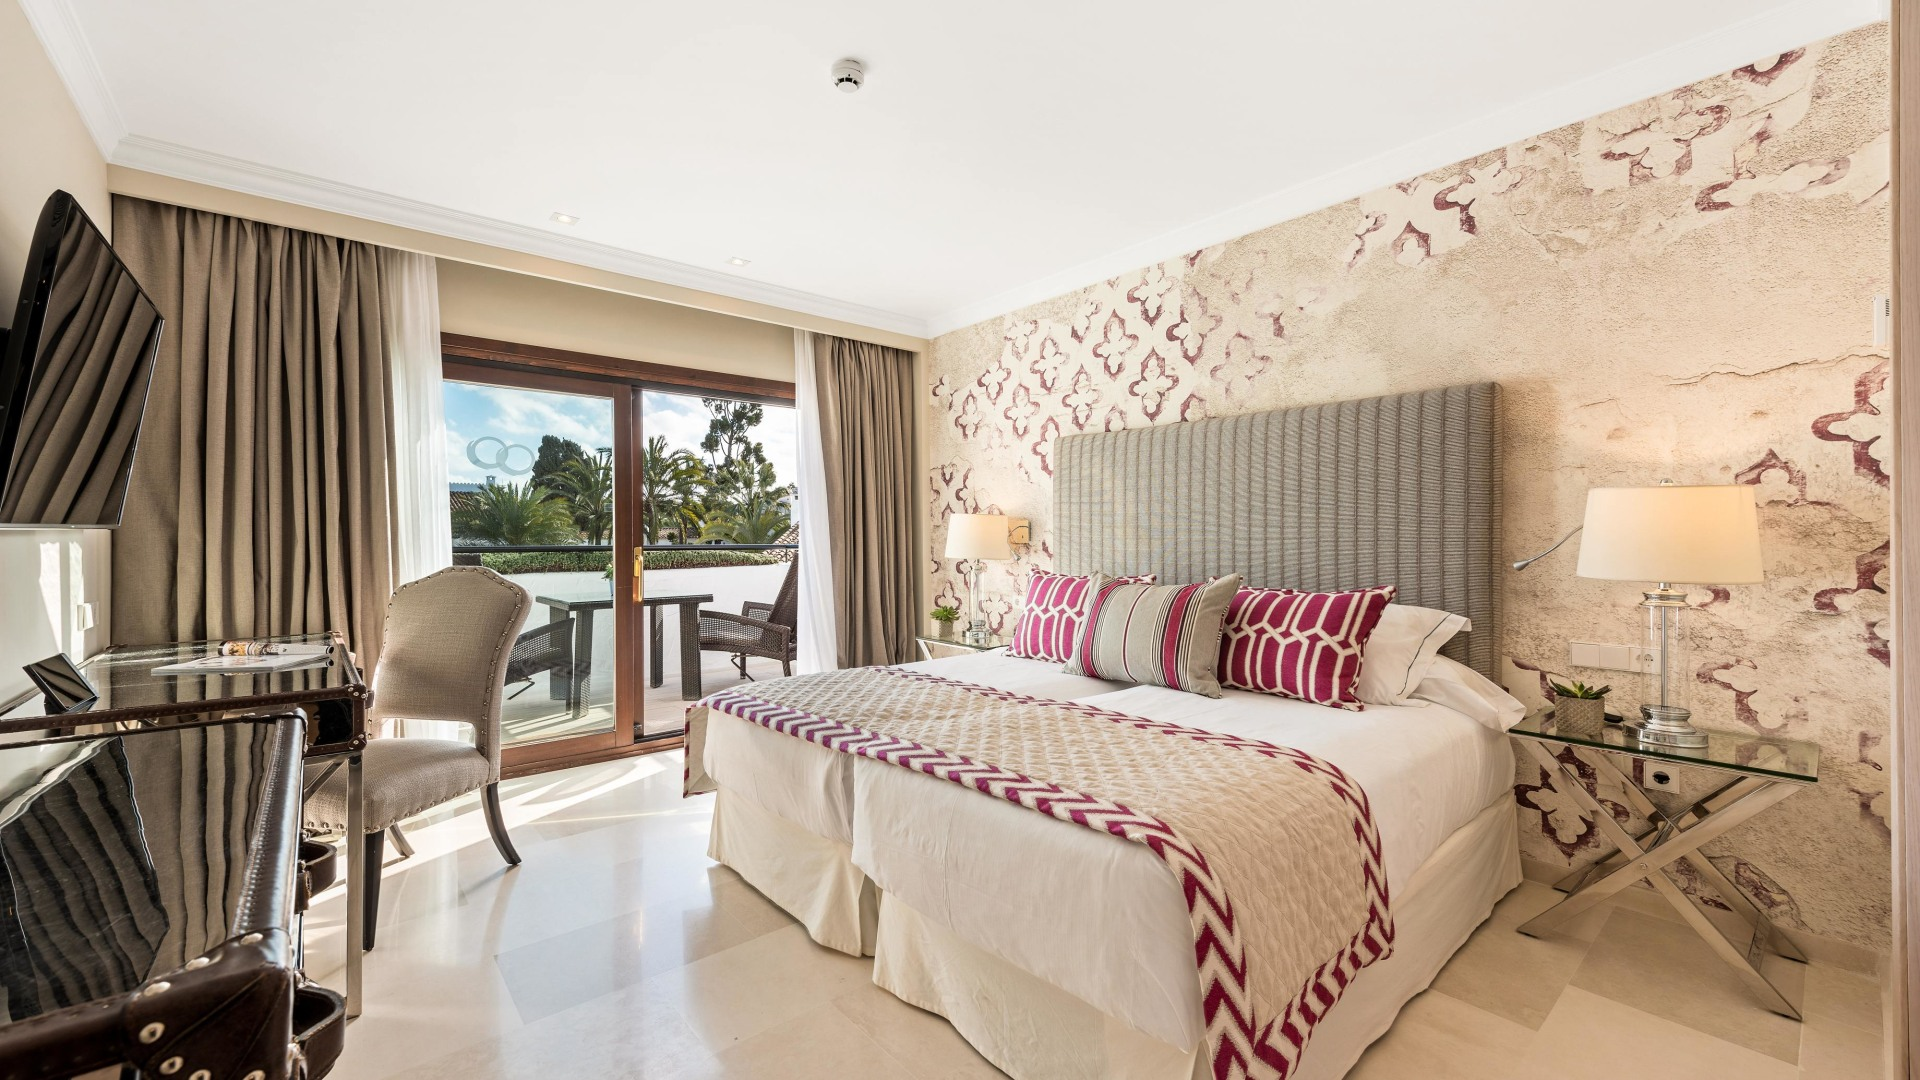 Innenansicht des Deluxe Rooms des Puente Romano Hotels